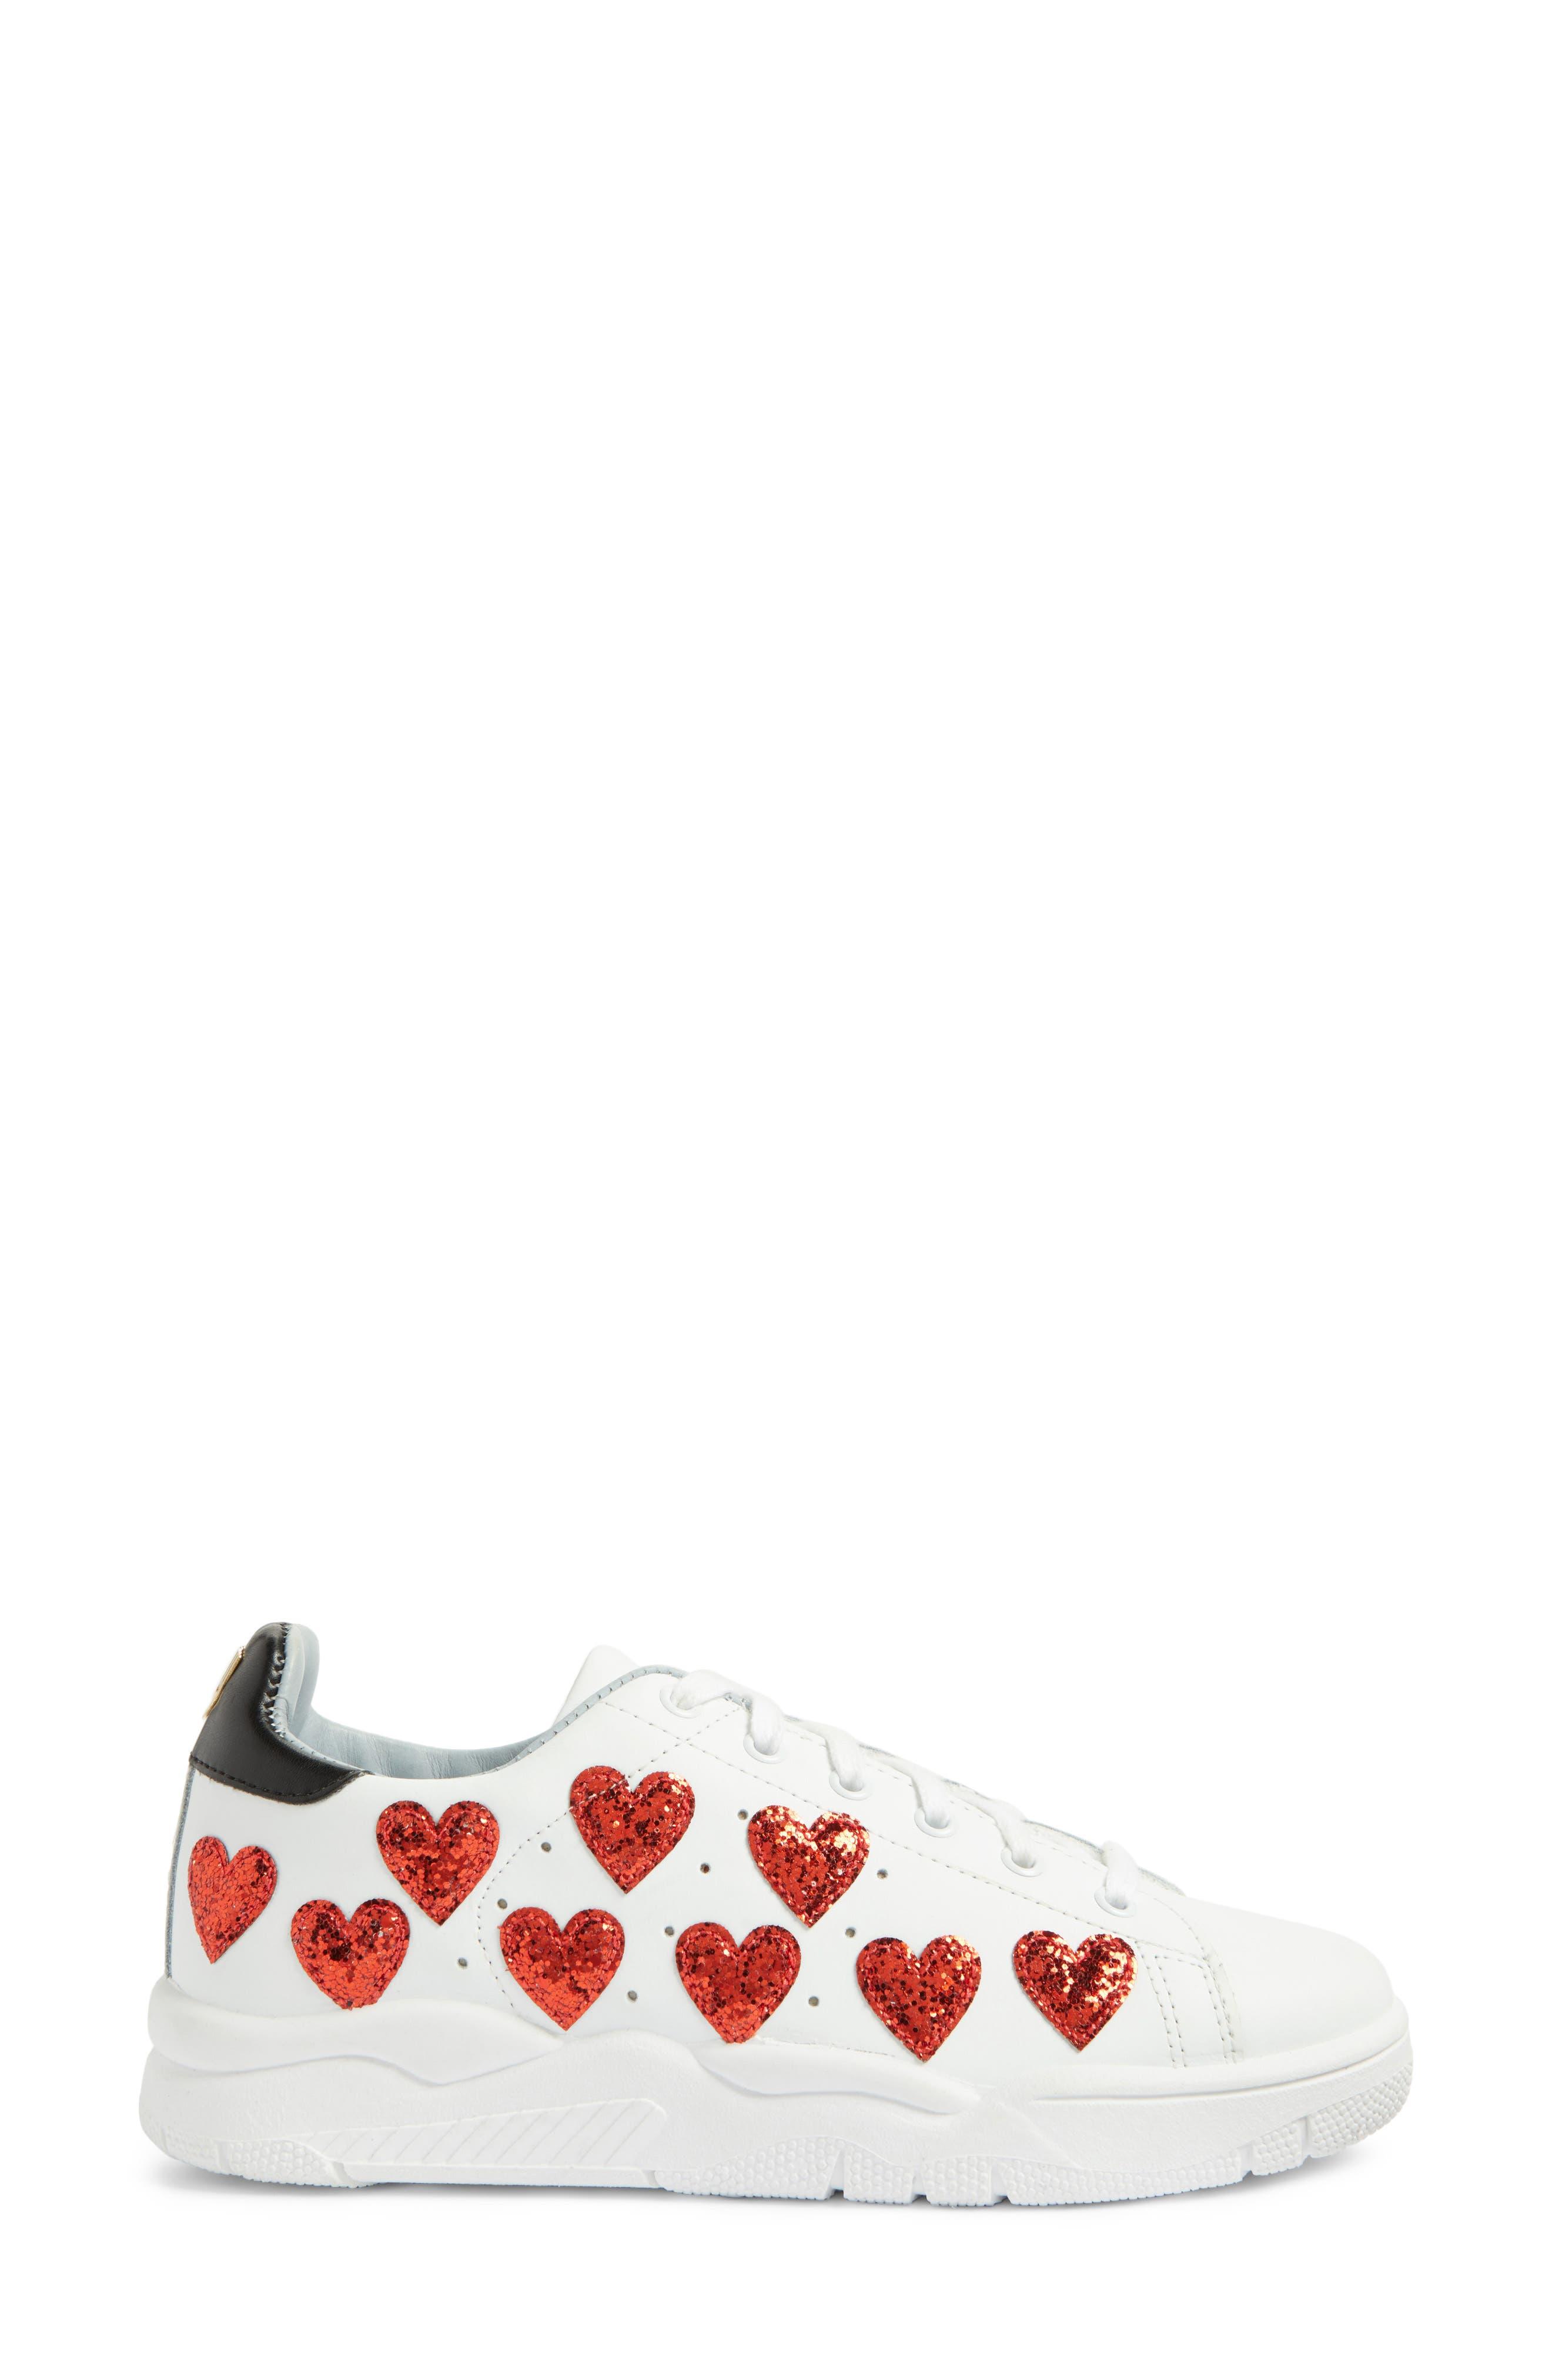 Hearts Roger Sneaker,                             Alternate thumbnail 3, color,                             White/ Red